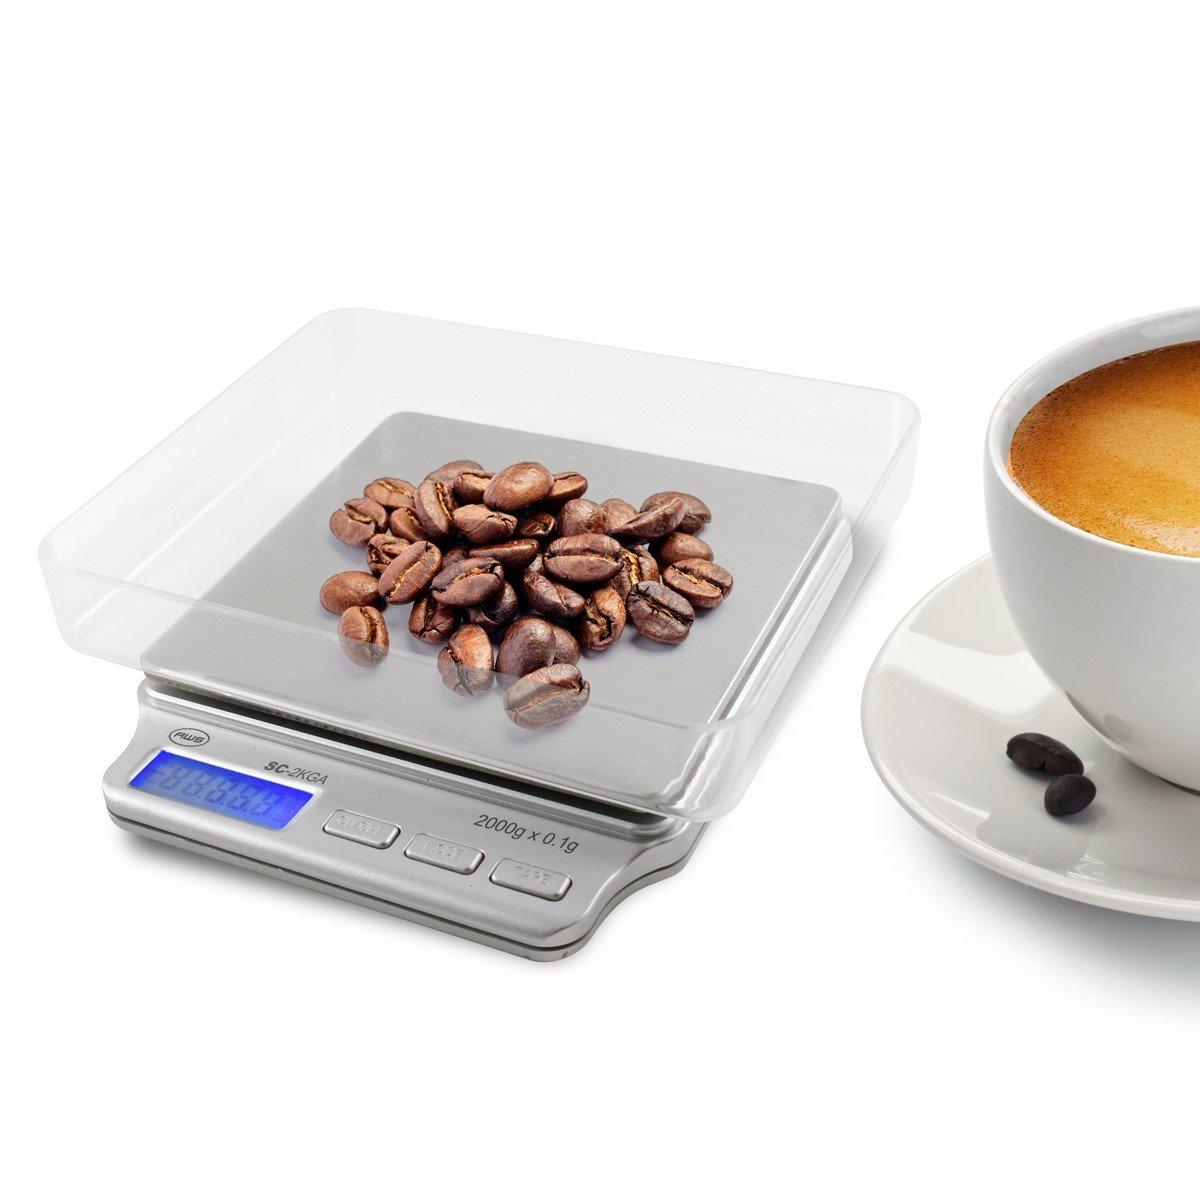 American Weigh Scales AMW-SC-2KG Digital Pocket Scale